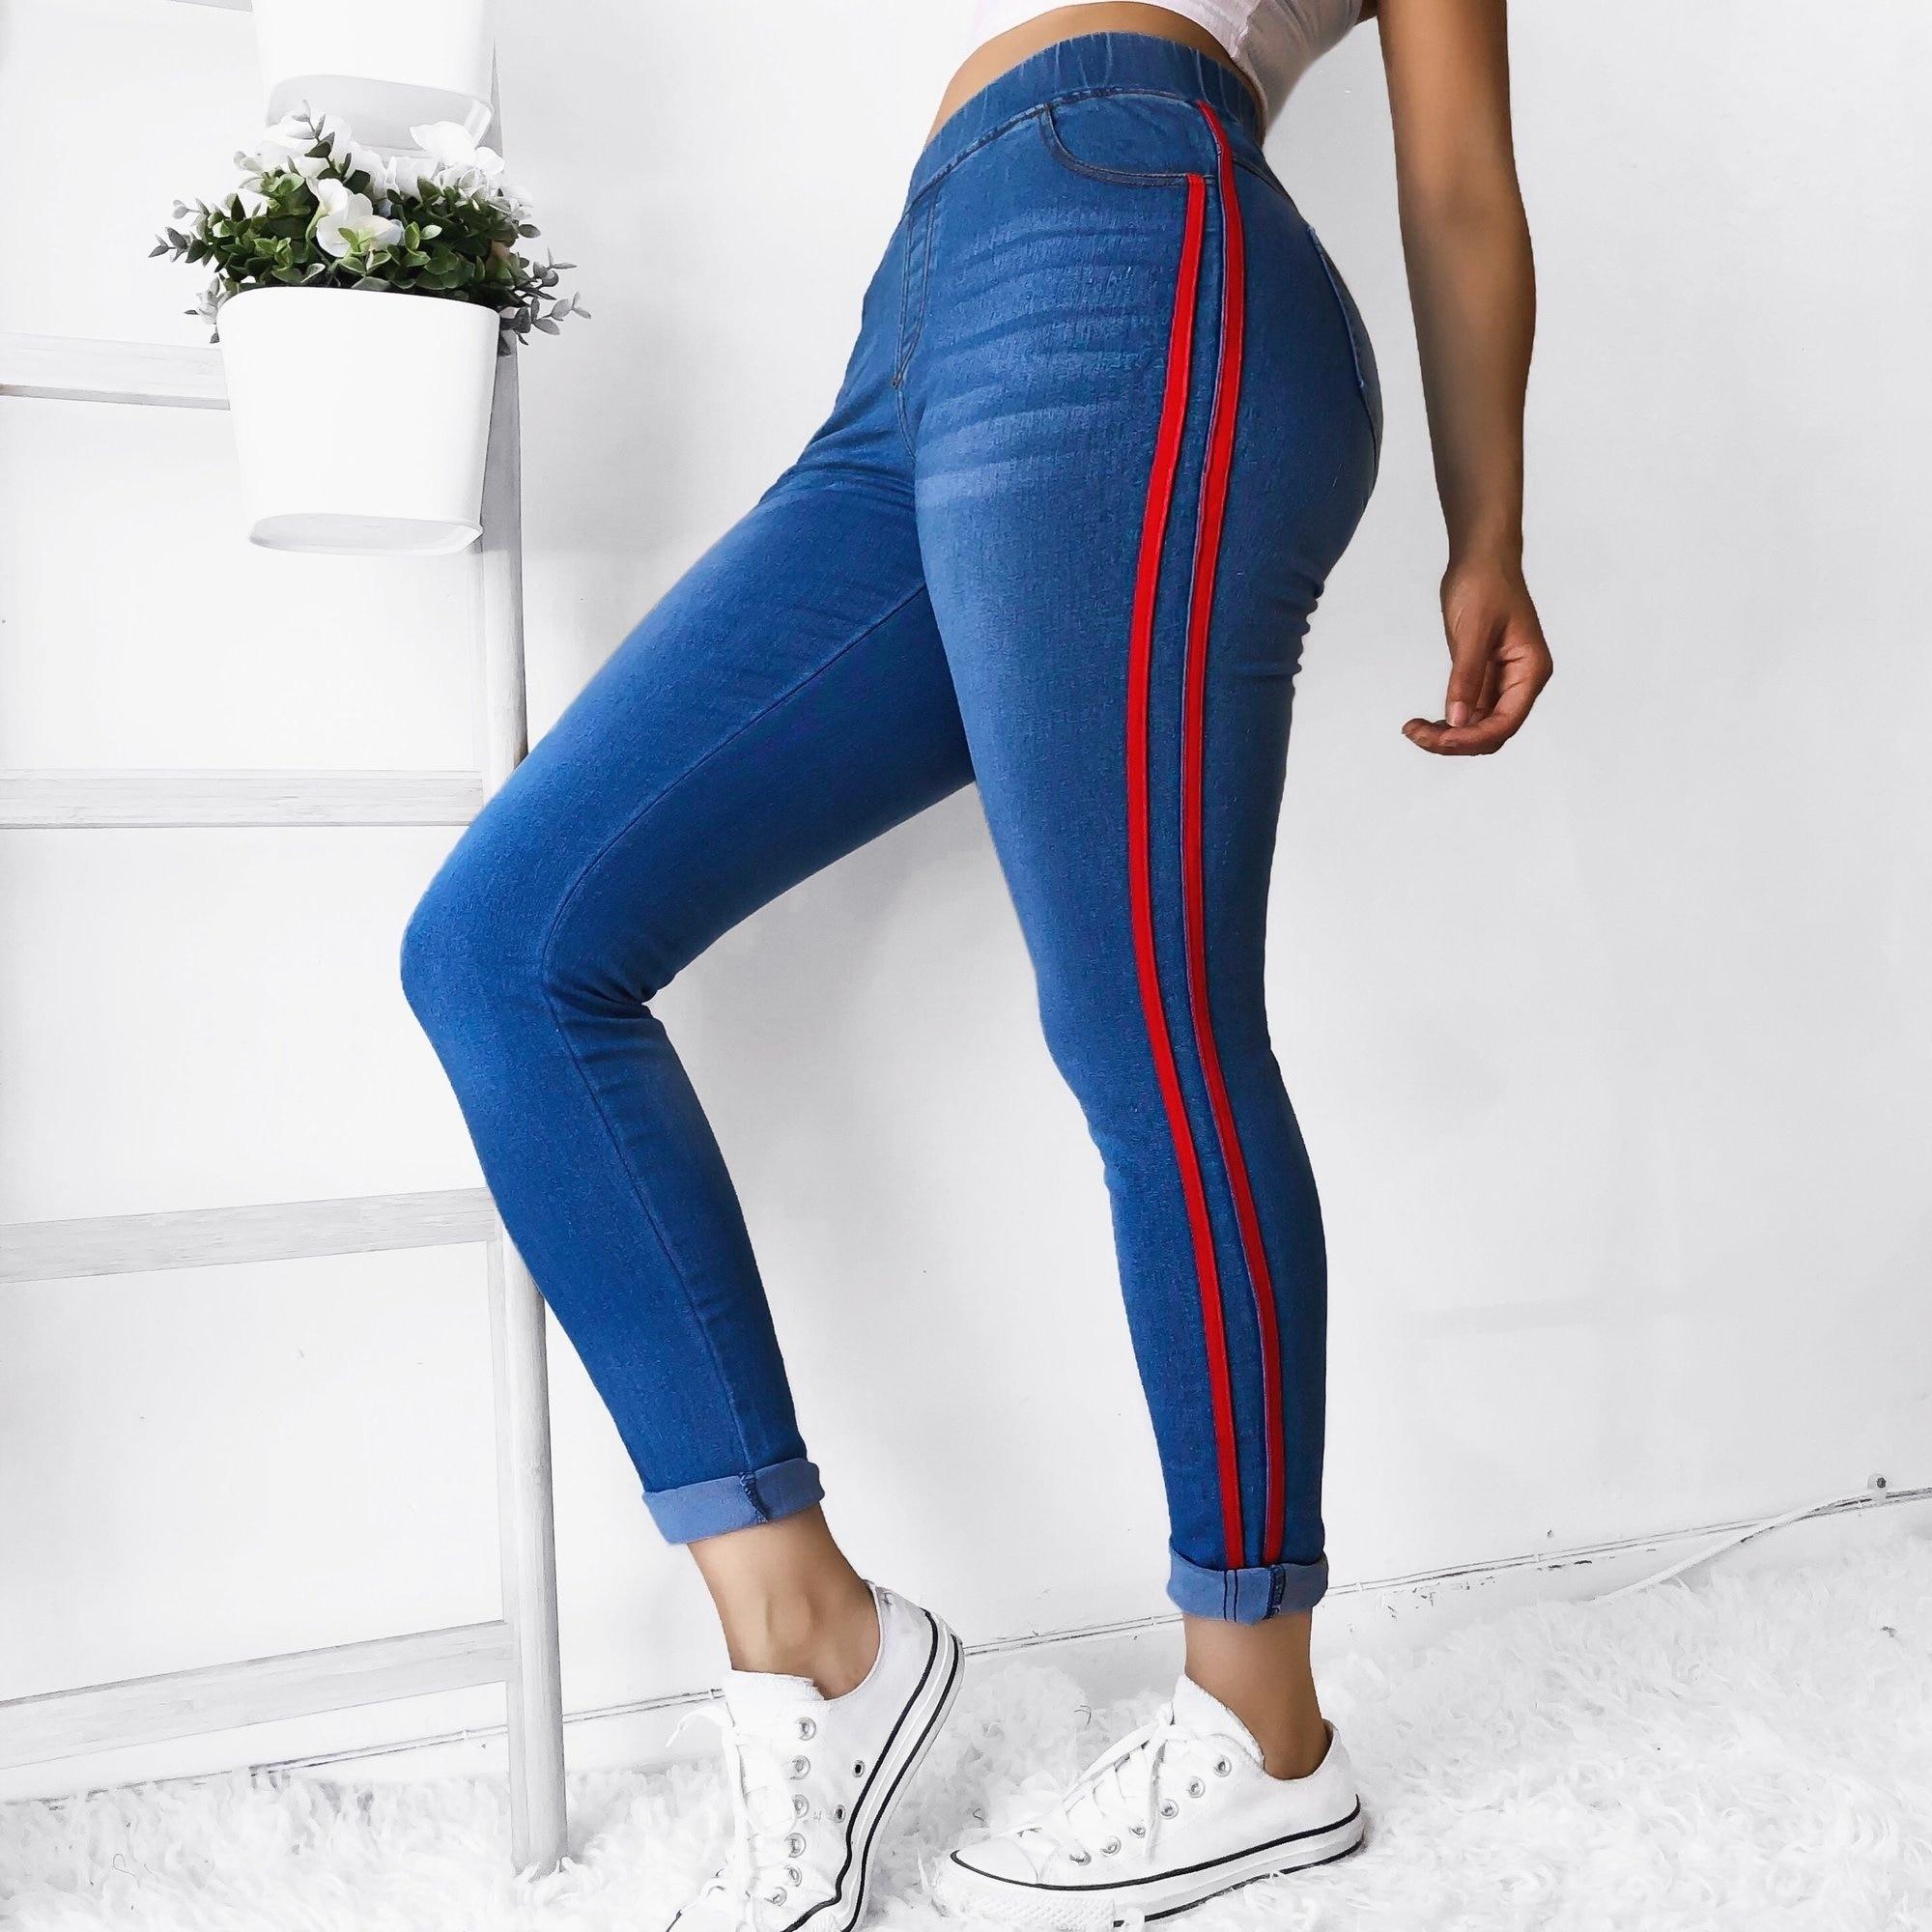 NIBESSER Side Striped Jeans Women High Waist Skinny Jeans 2018 New Style Cotton Denim Leggings Femme Plus size Trousers 4XL